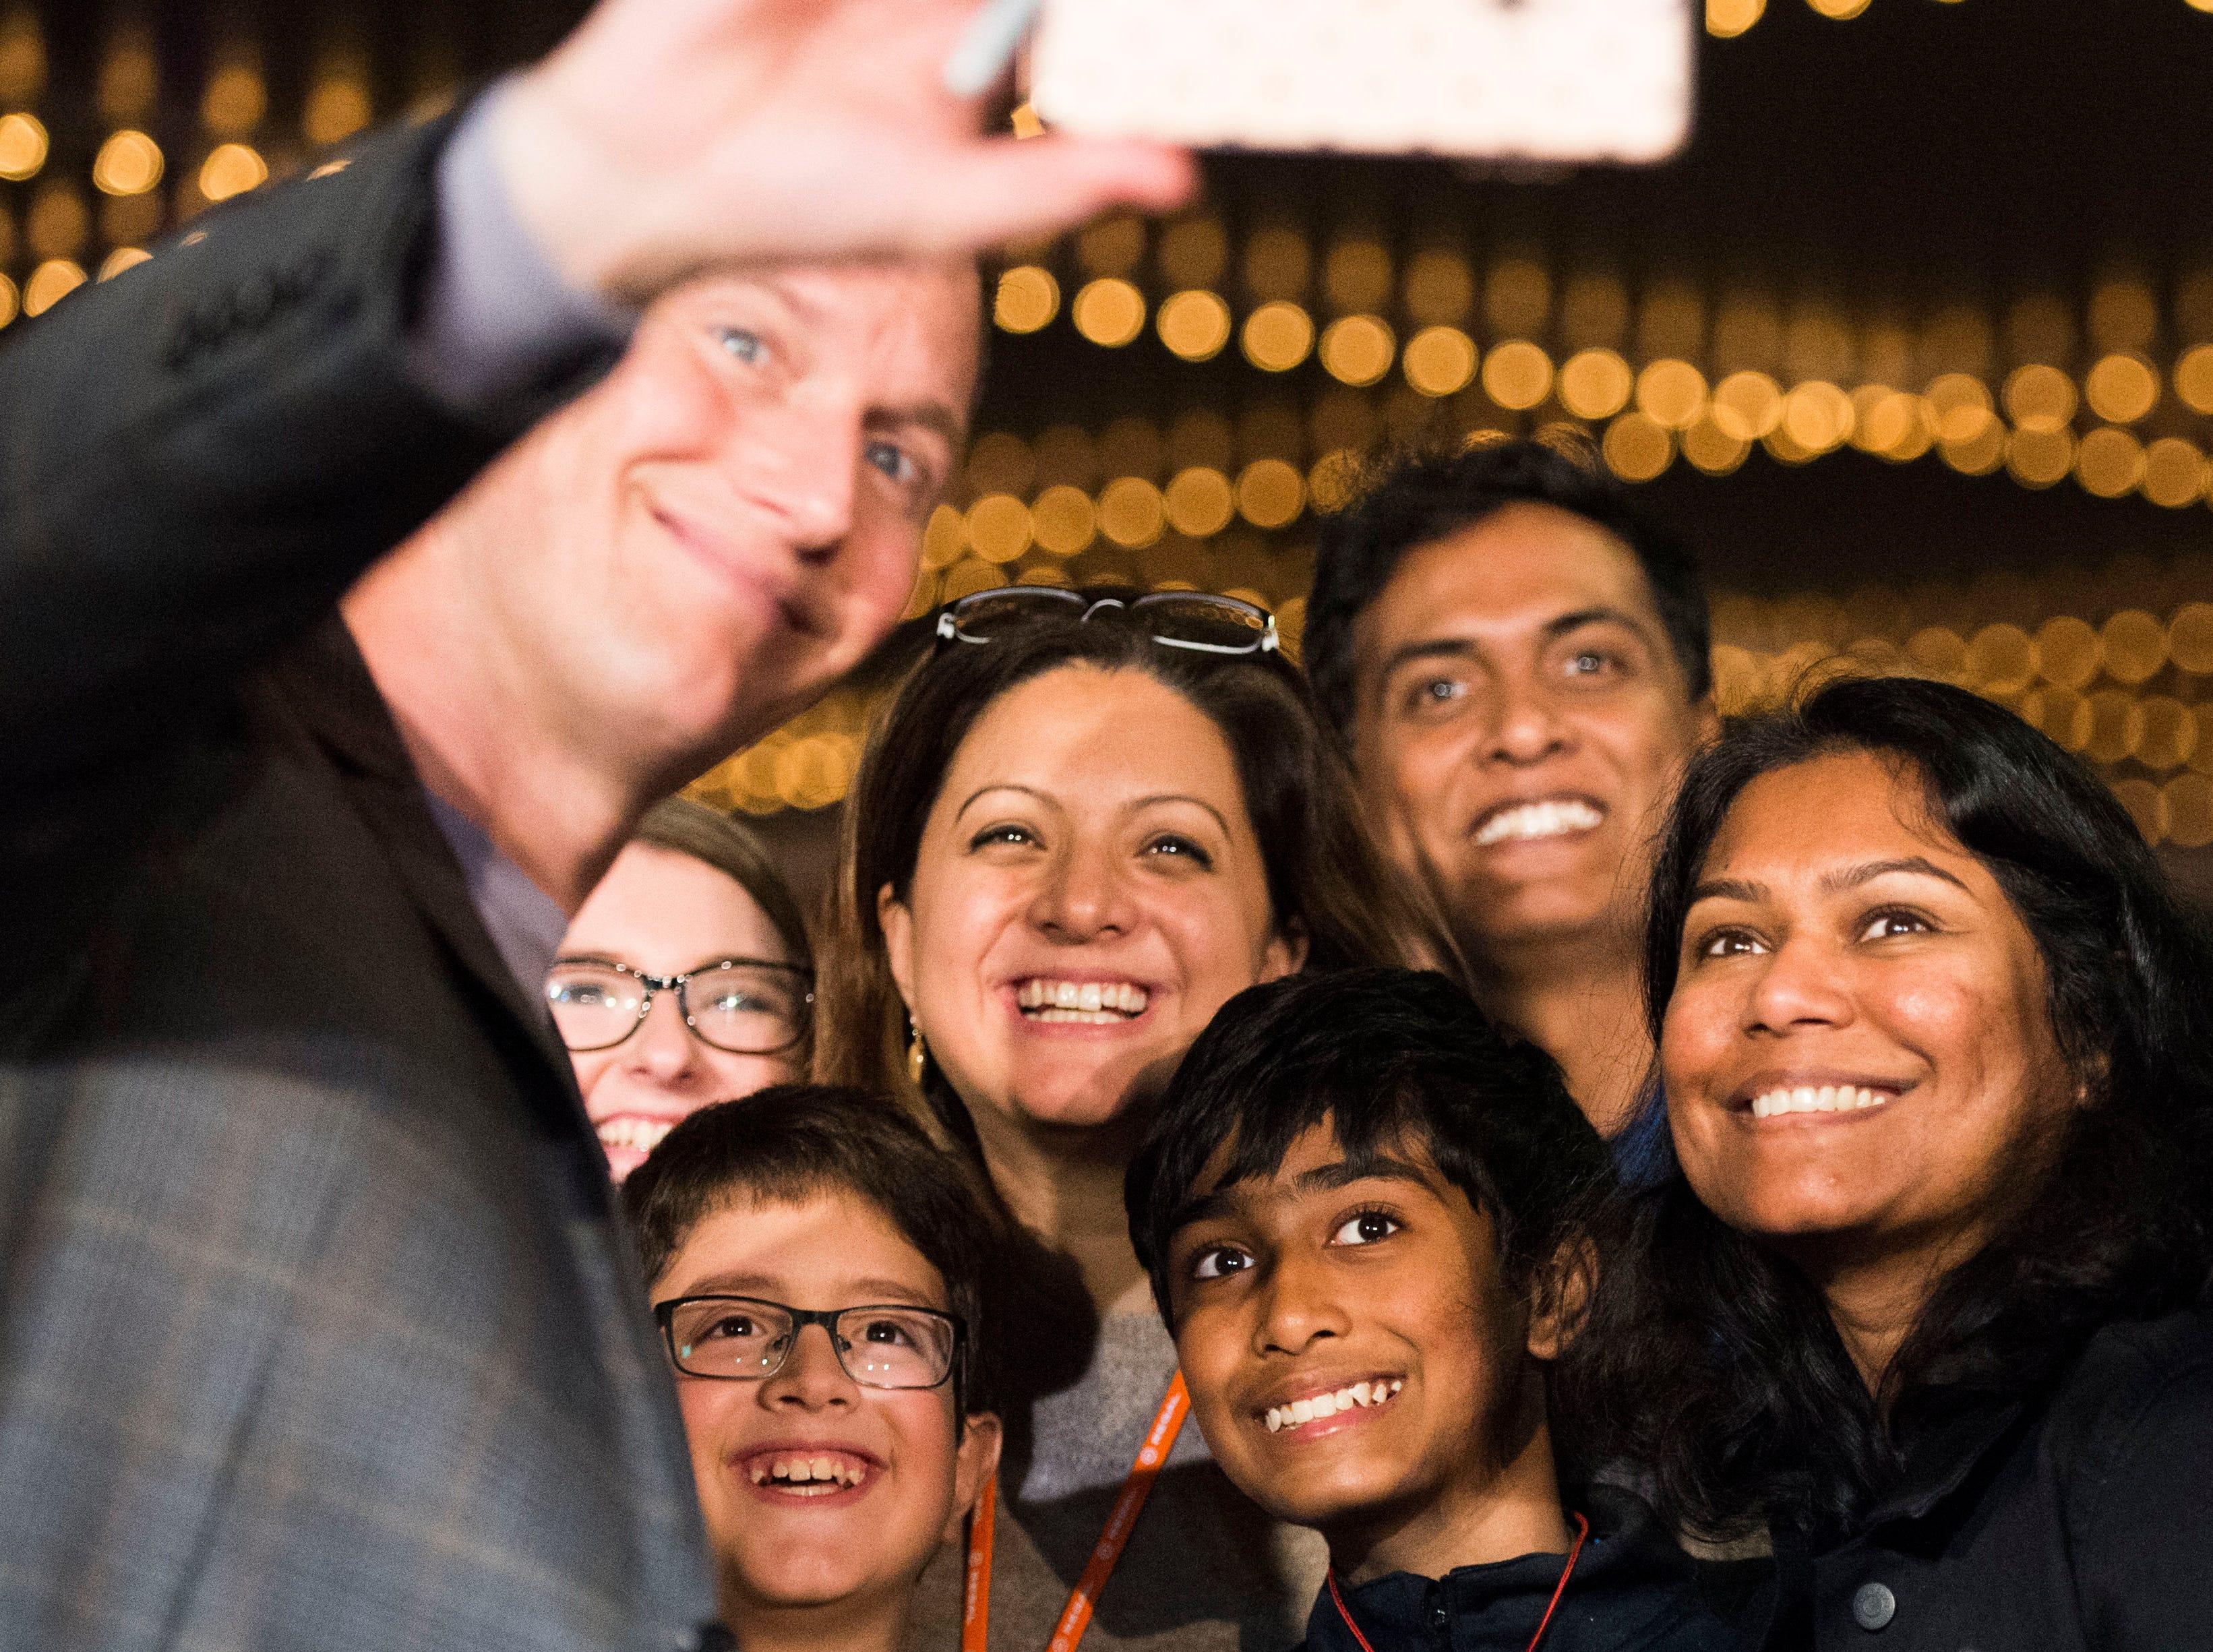 """Aquaman"" star Patrick Wilson greets fans at Regal's annual red carpet premiere for Variety at Regal Pinnacle Stadium 18, Thursday, Dec. 13, 2018."